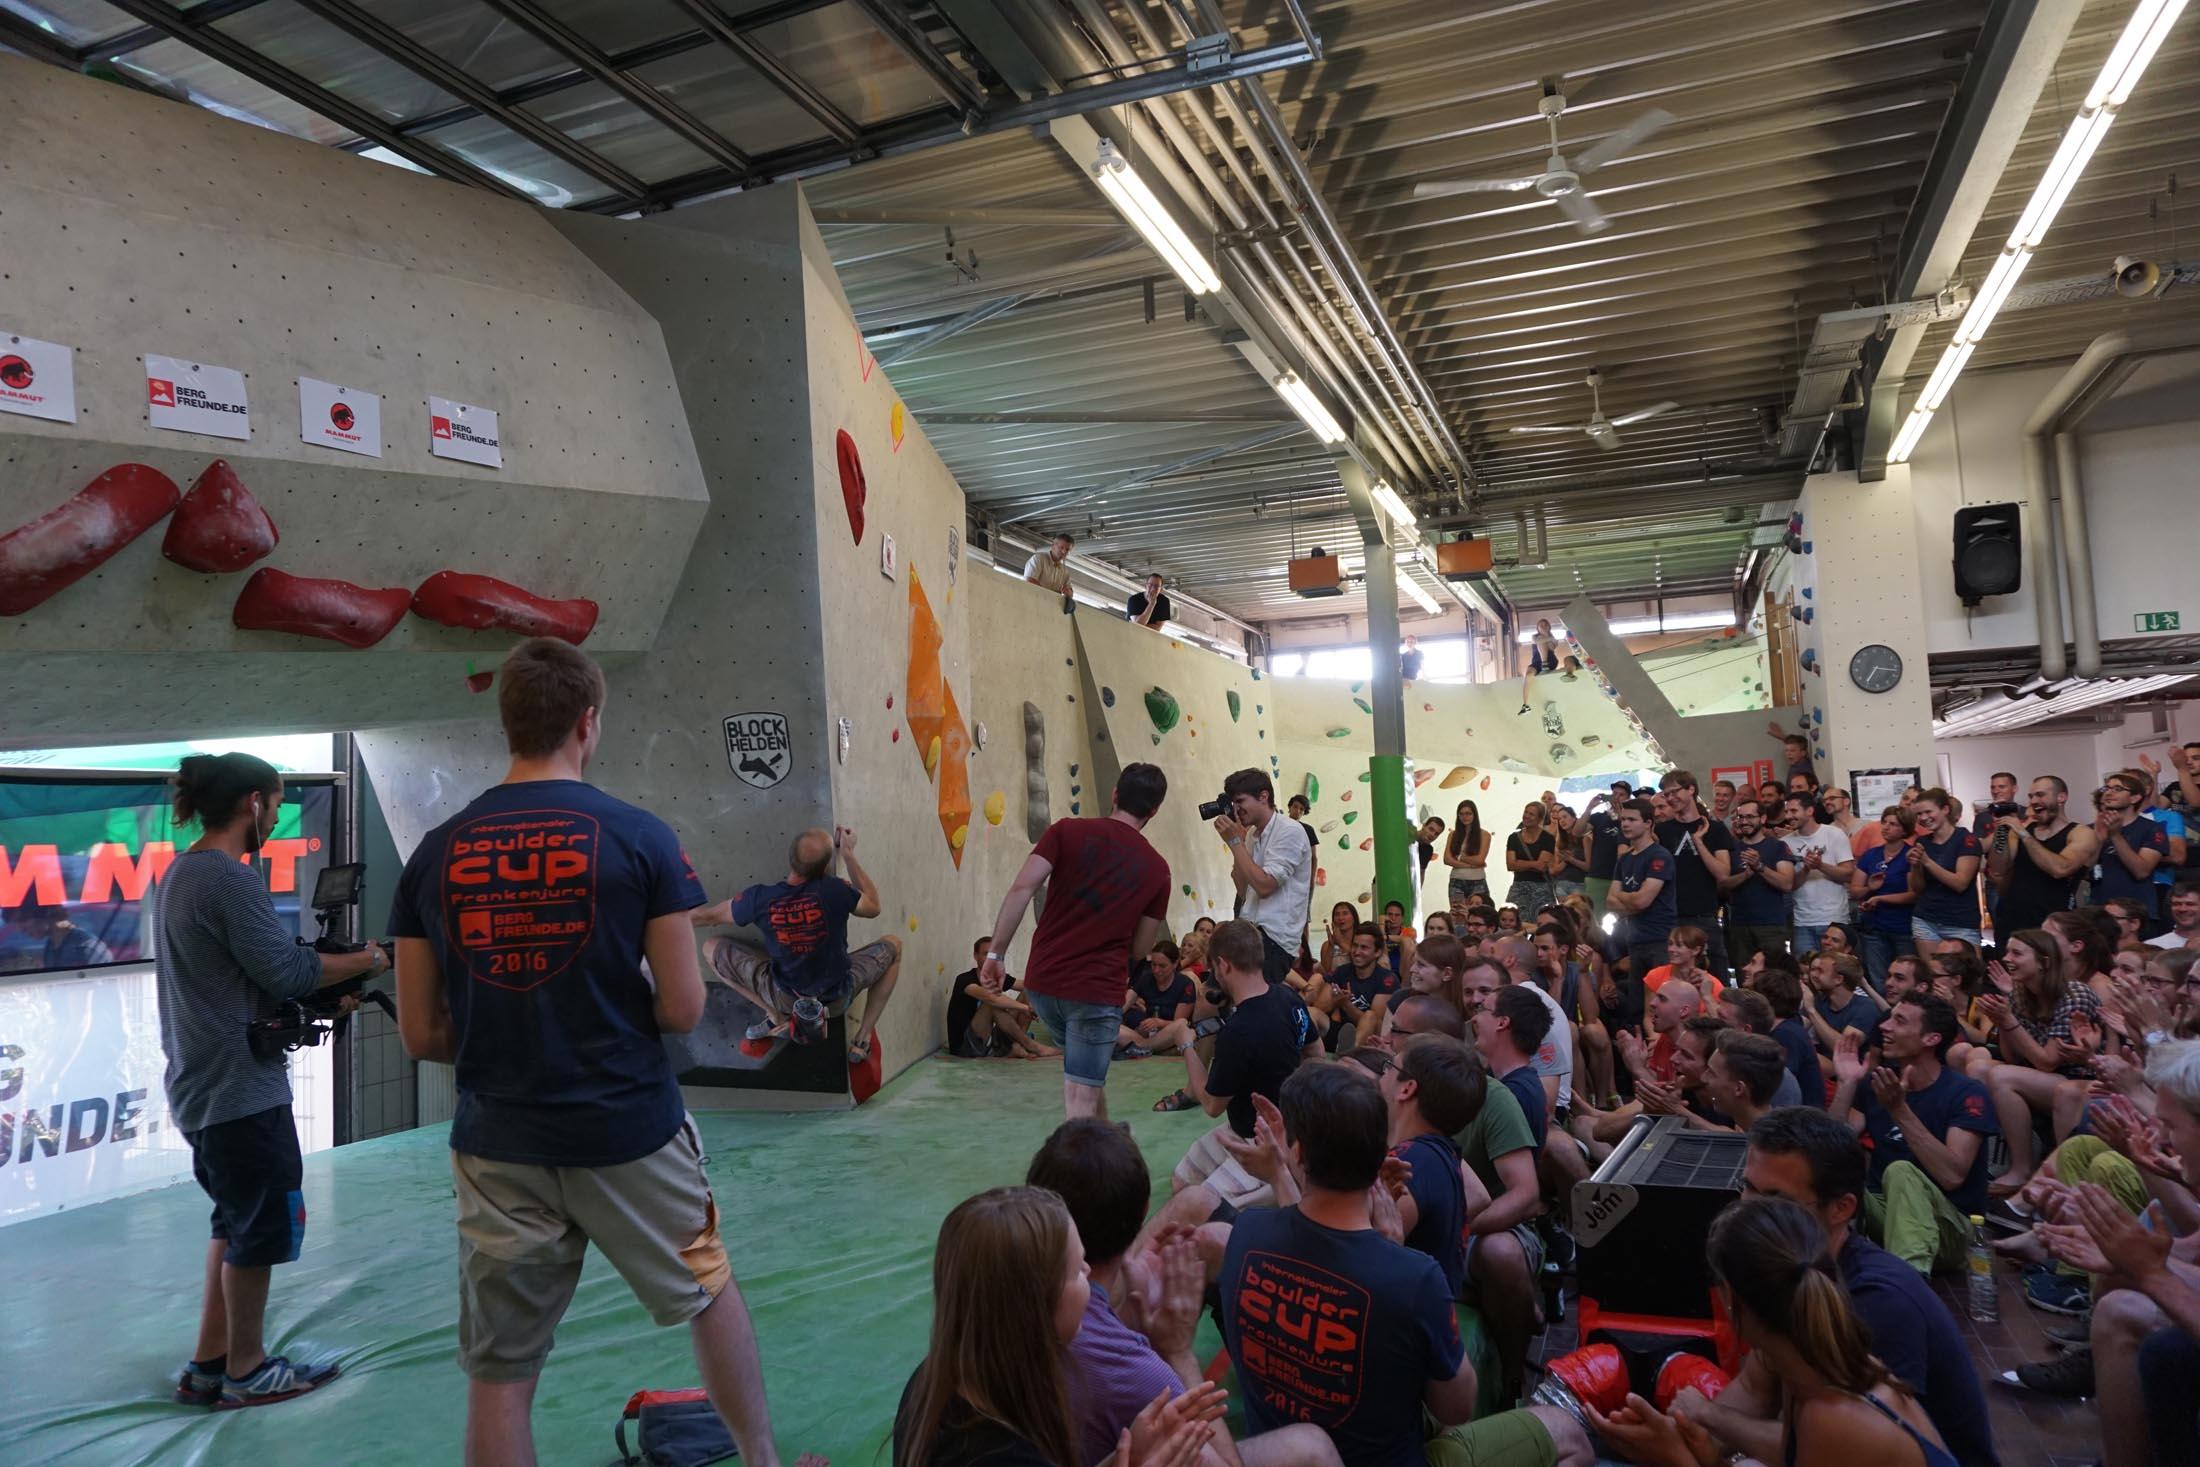 Finale, internationaler bouldercup Frankenjura 2016, BLOCKHELDEN Erlangen, Mammut, Bergfreunde.de, Boulderwettkampf07092016595